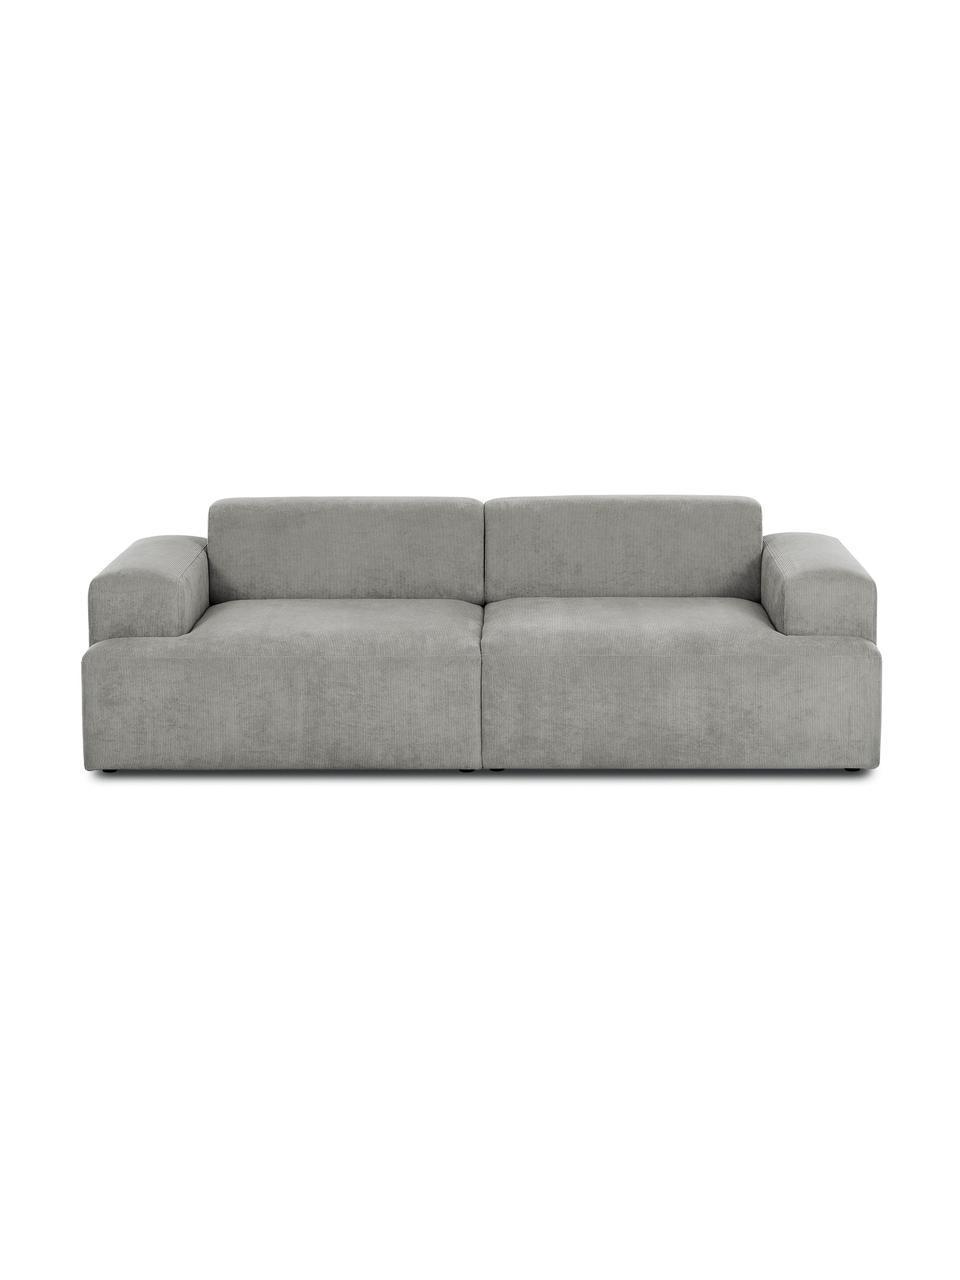 Sofa ze sztruksu Melva (3-osobowa), Tapicerka: sztruks (92% poliester, 8, Nogi: drewno sosnowe Nogi znajd, Sztruks szary, S 240 x G 101 cm